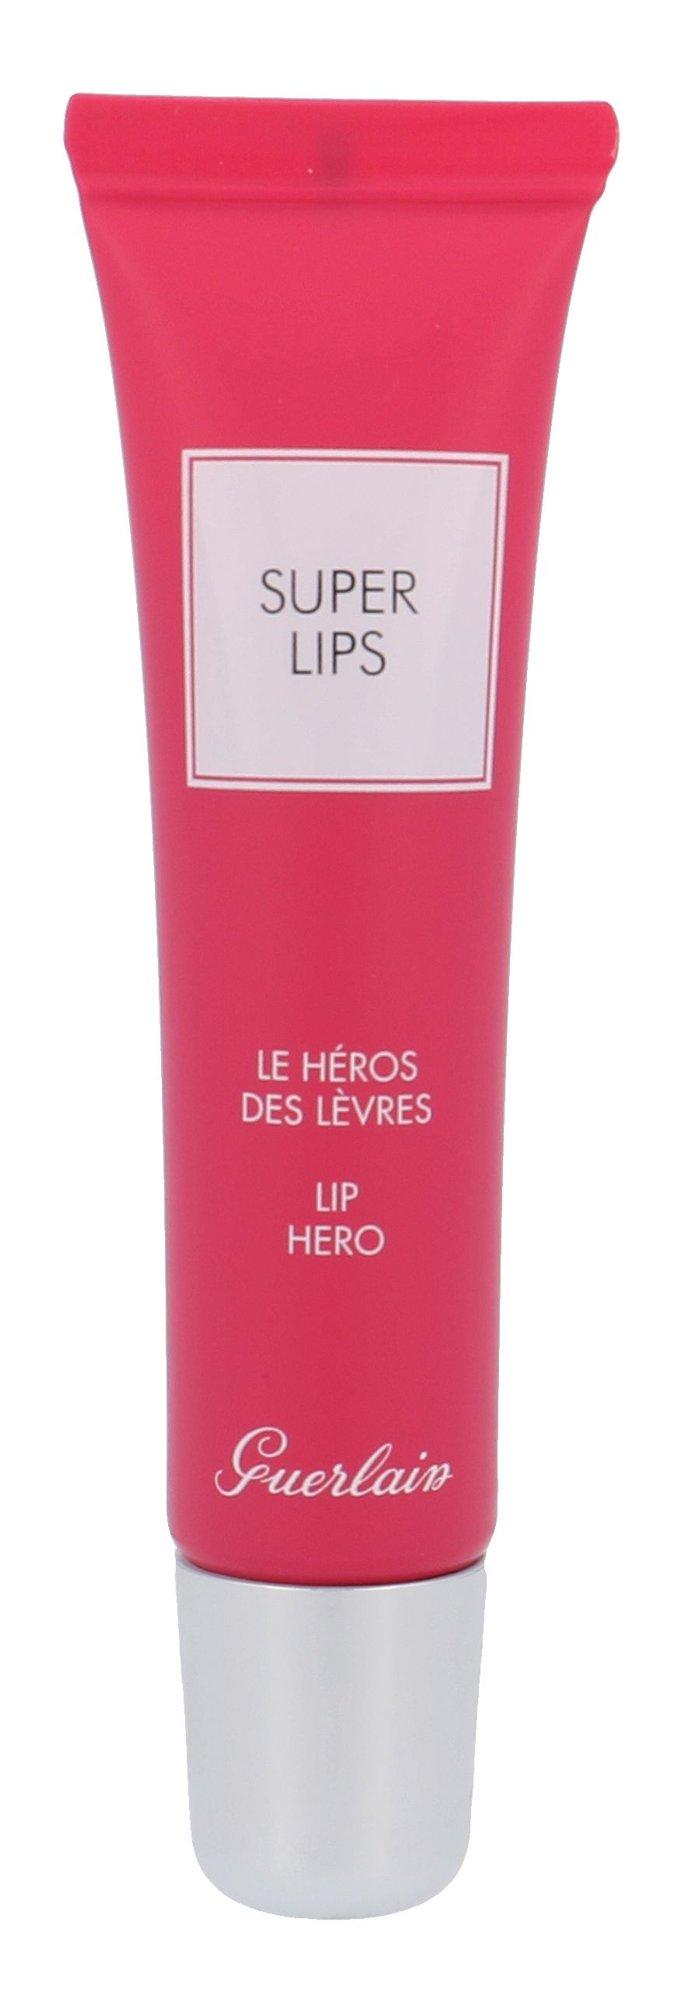 Guerlain My Supertips Cosmetic 15ml  Super Lips